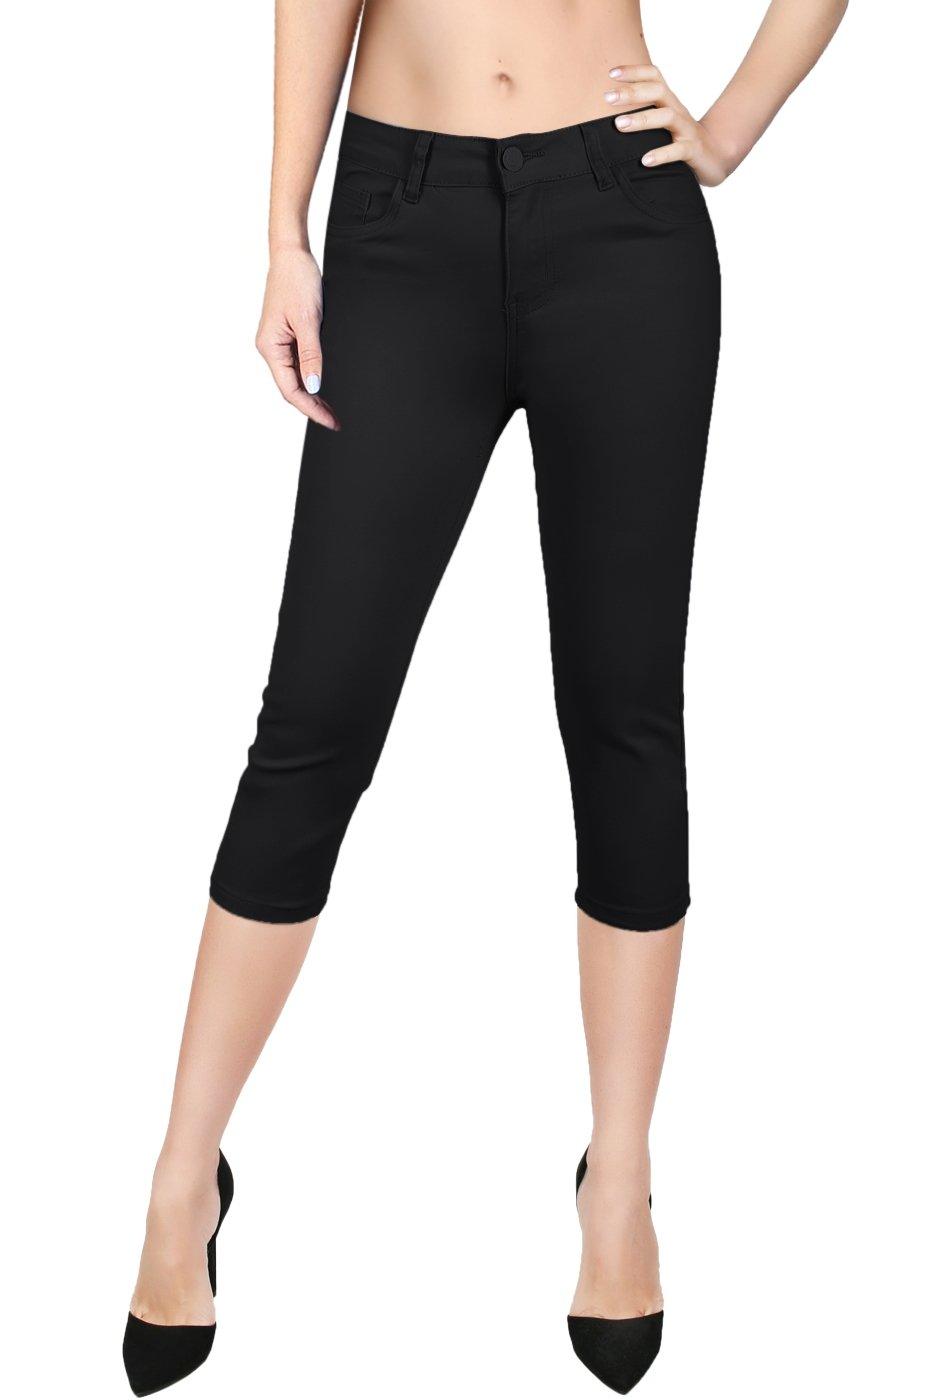 2LUV Women's Stretchy 5 Pocket Solid Skinny Capri Jeans Black 7